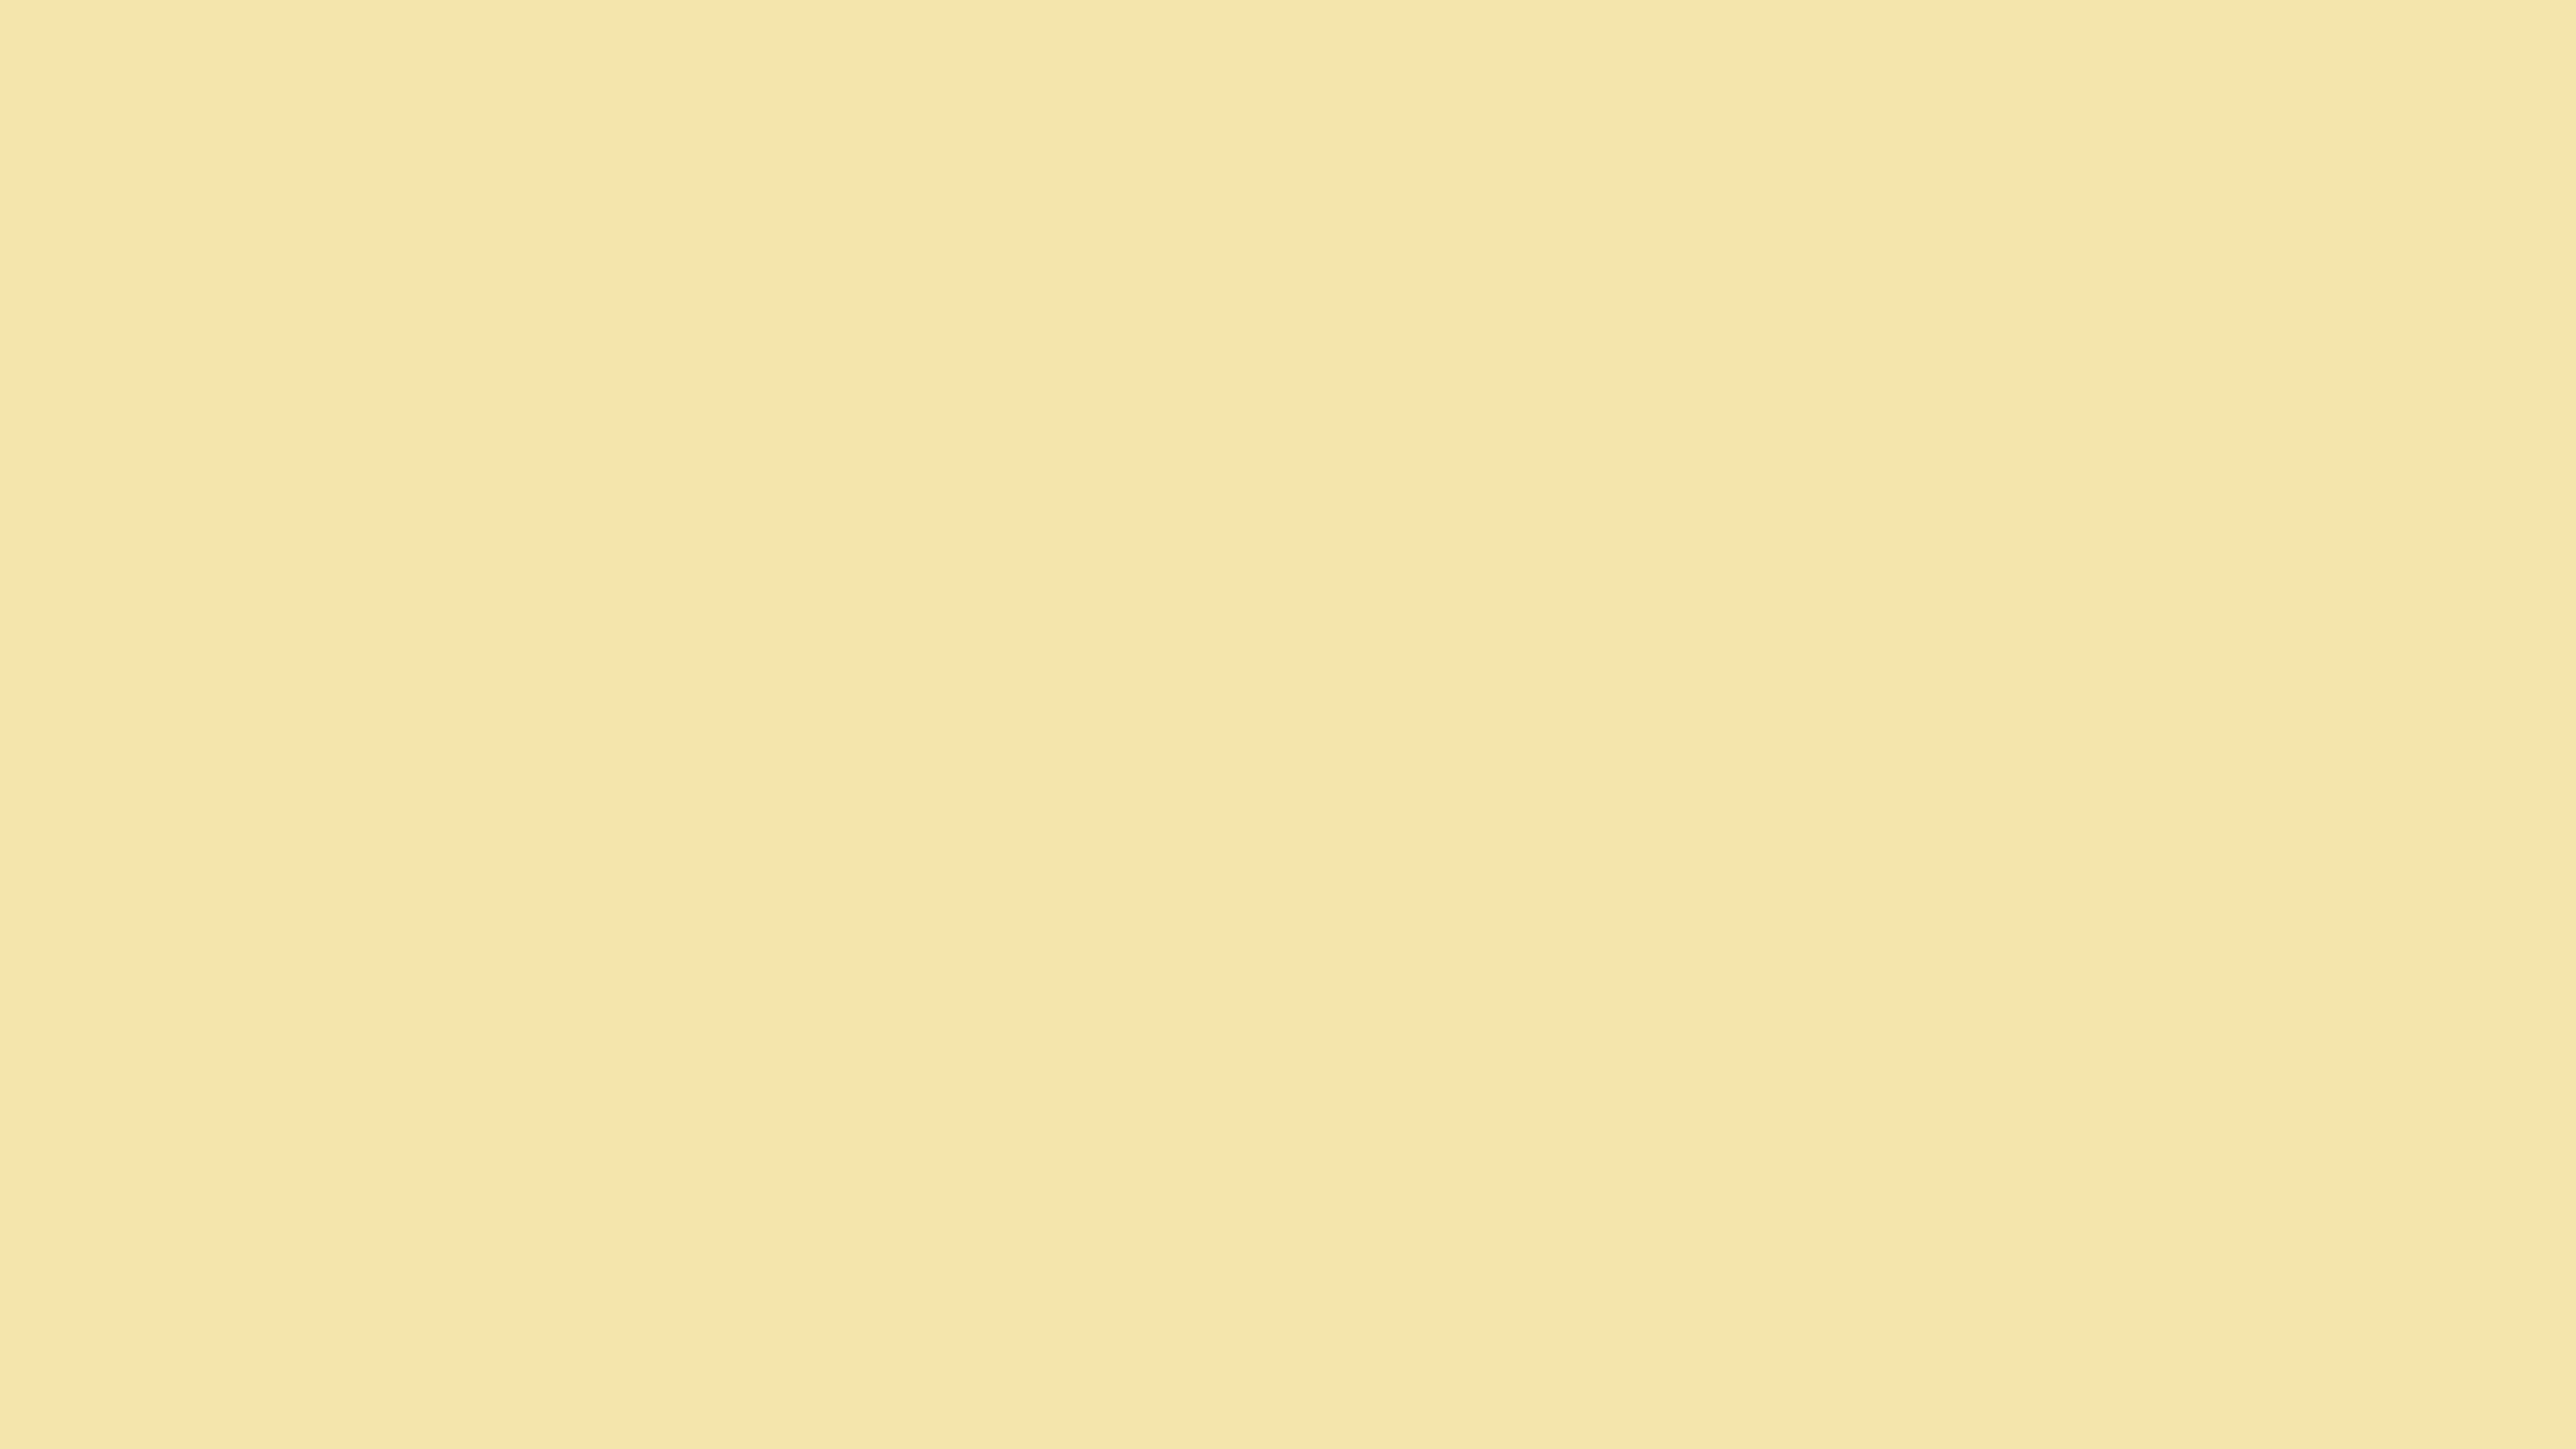 7680x4320 Vanilla Solid Color Background